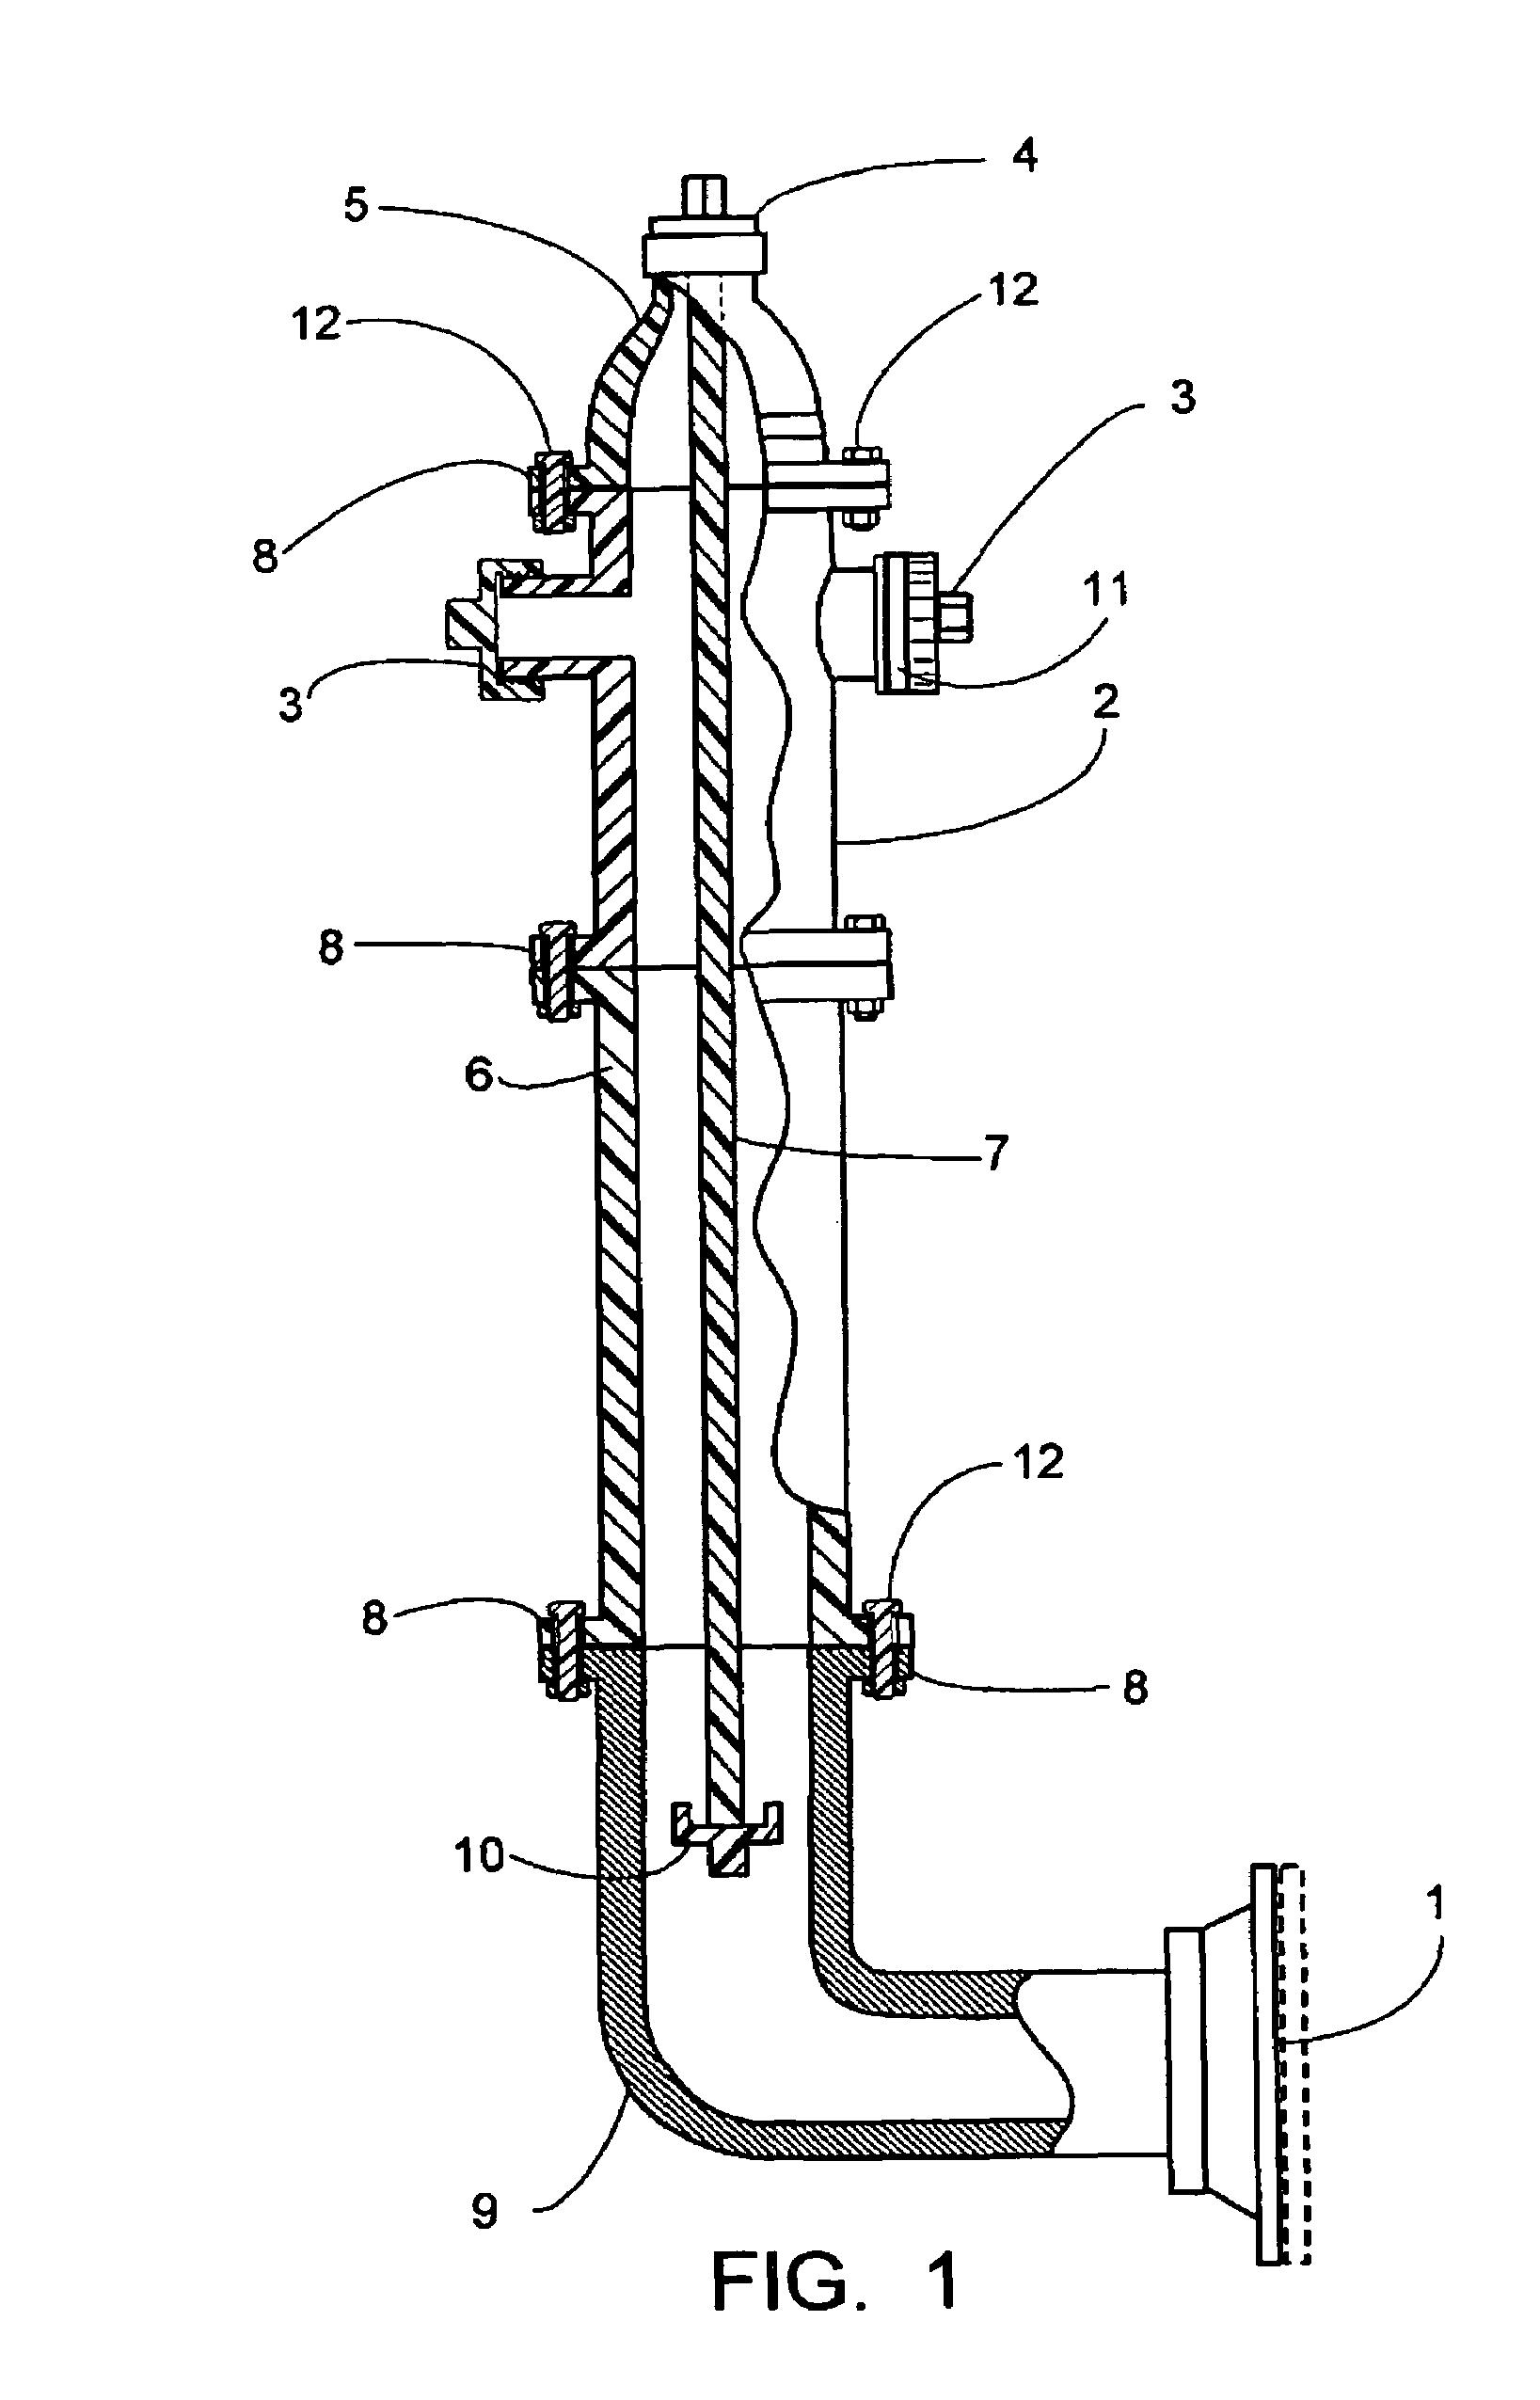 basic fire hydrant diagram 2001 s10 brake light wiring patent us7588049 polymeric google patents